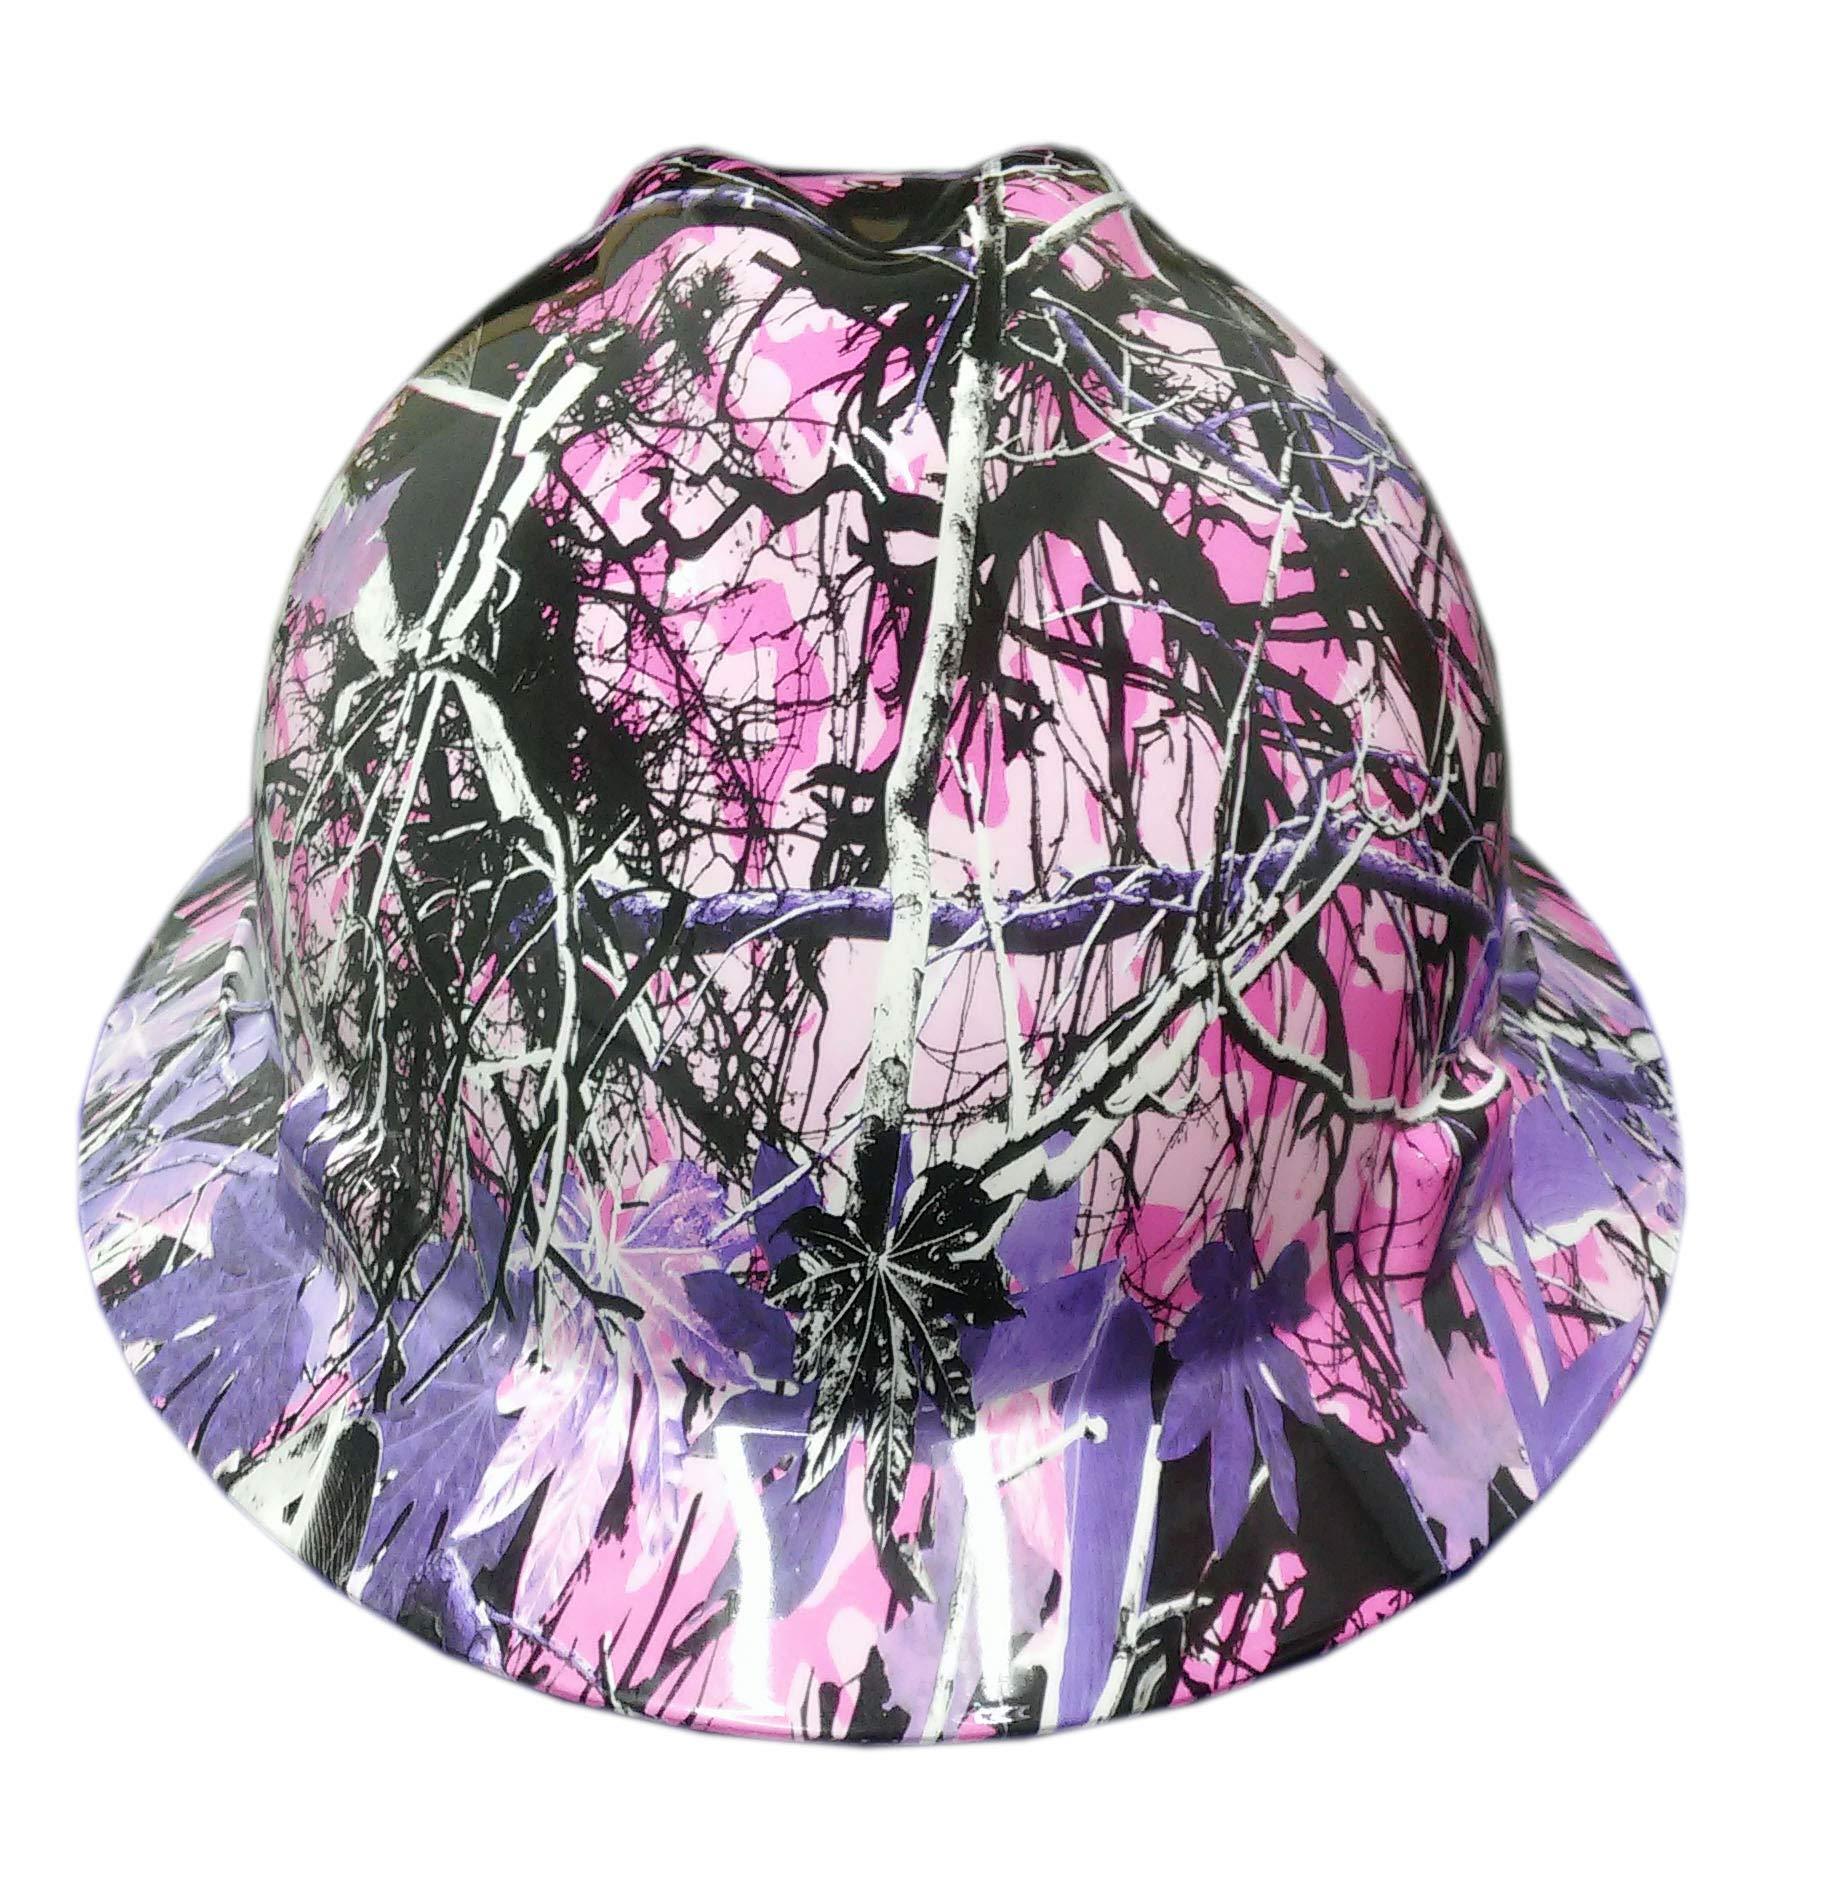 Izzo Graphics Camo Girl MSA Full Brim Hard Hat